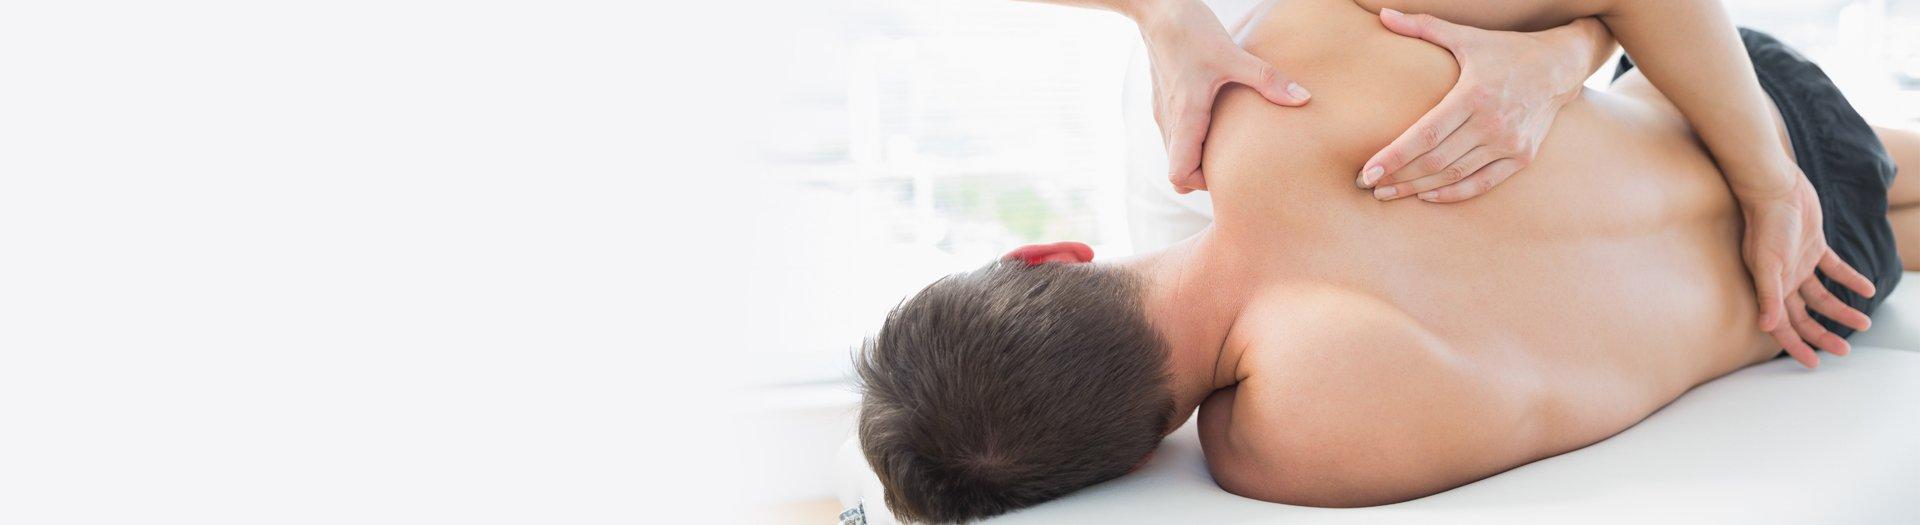 clinica fisioterapia malaga